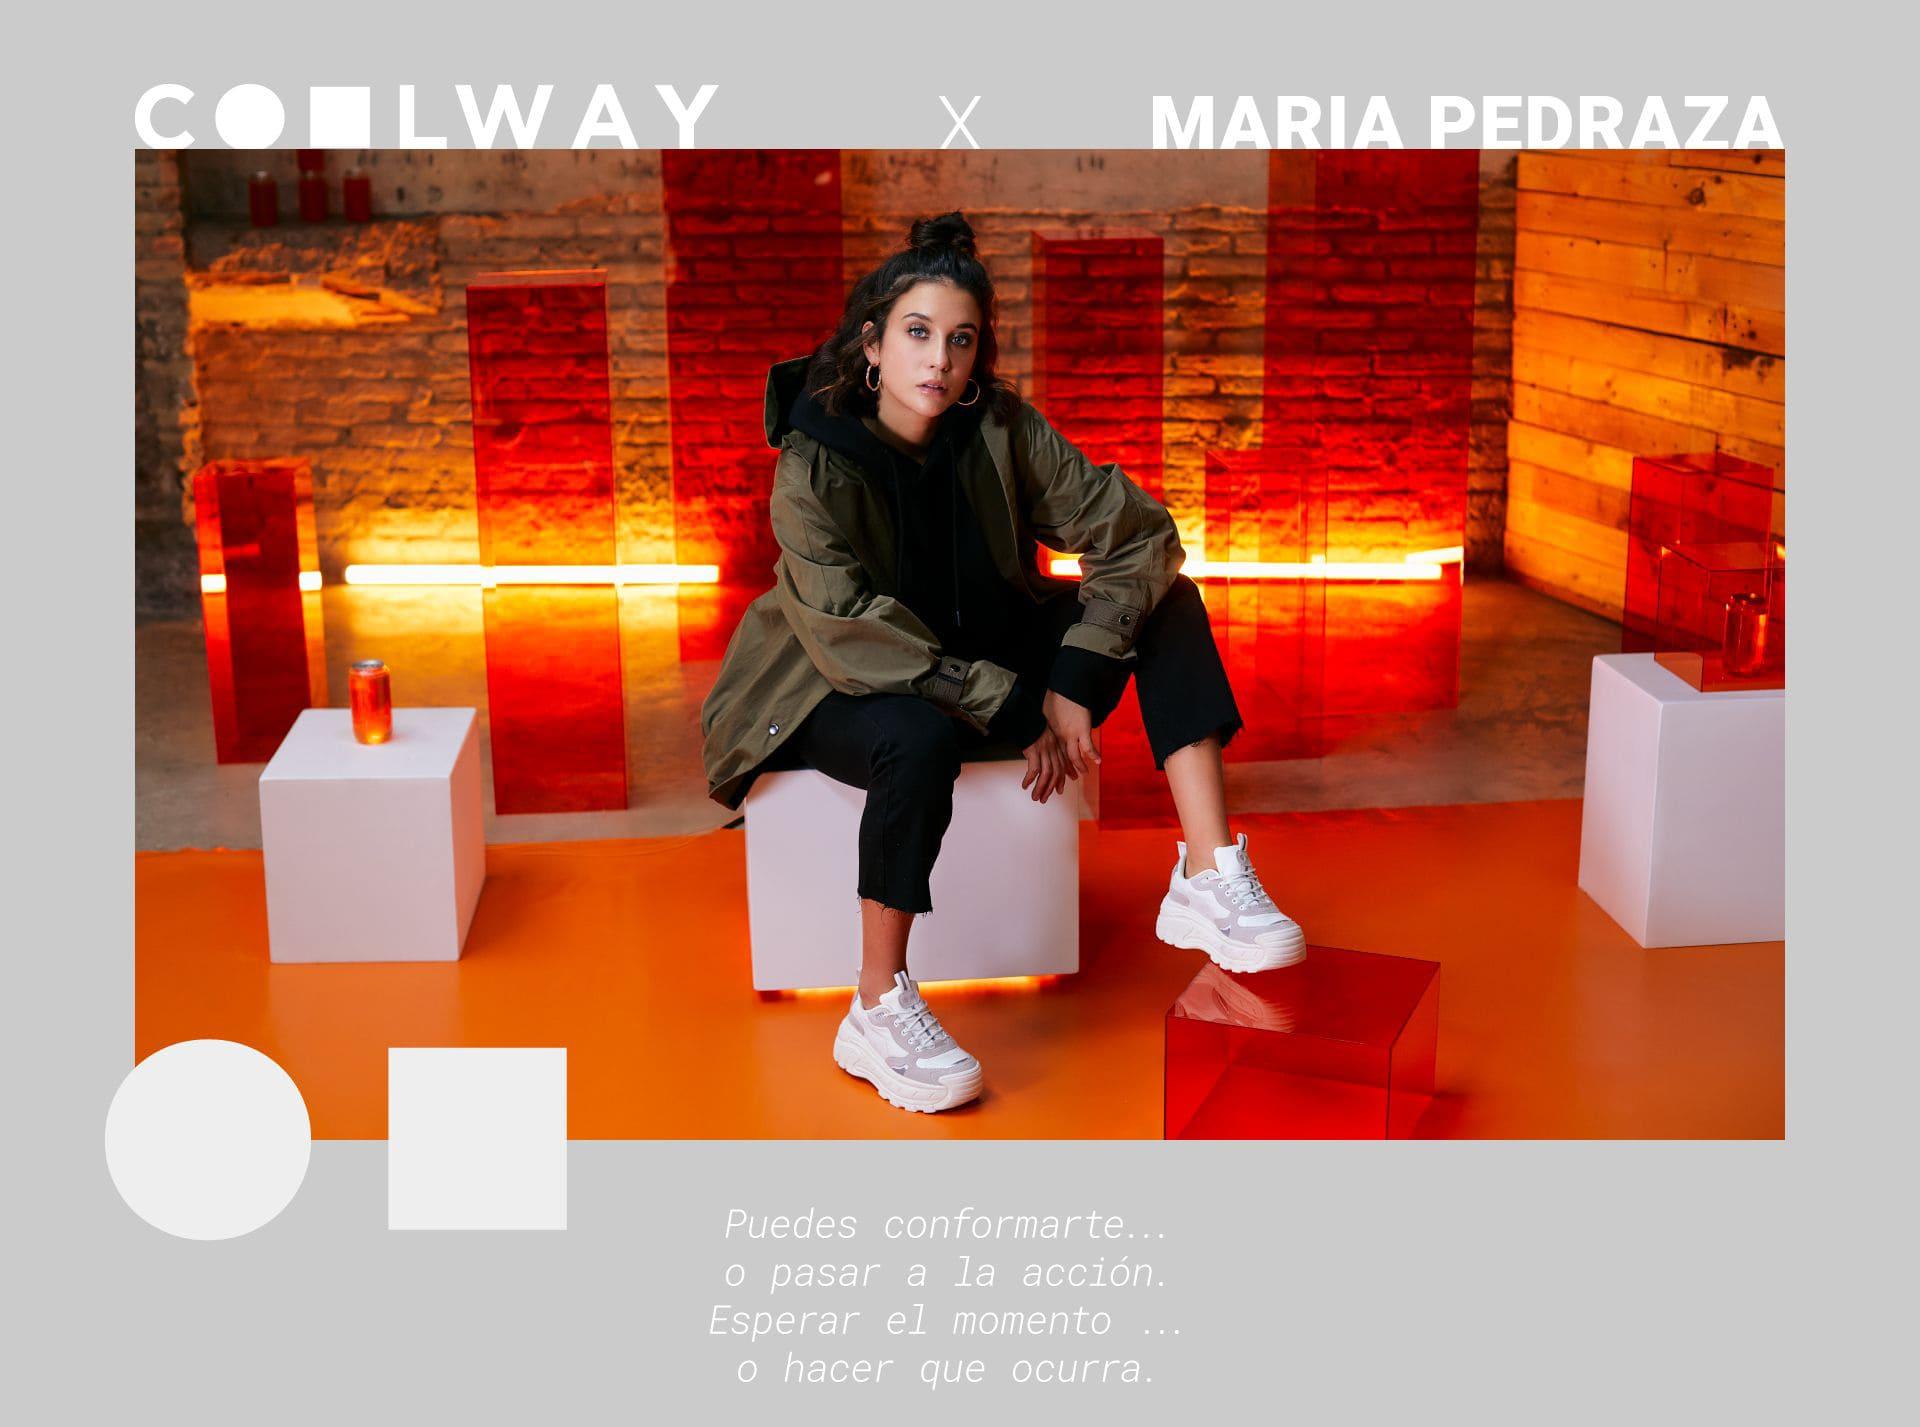 MariaPedraza